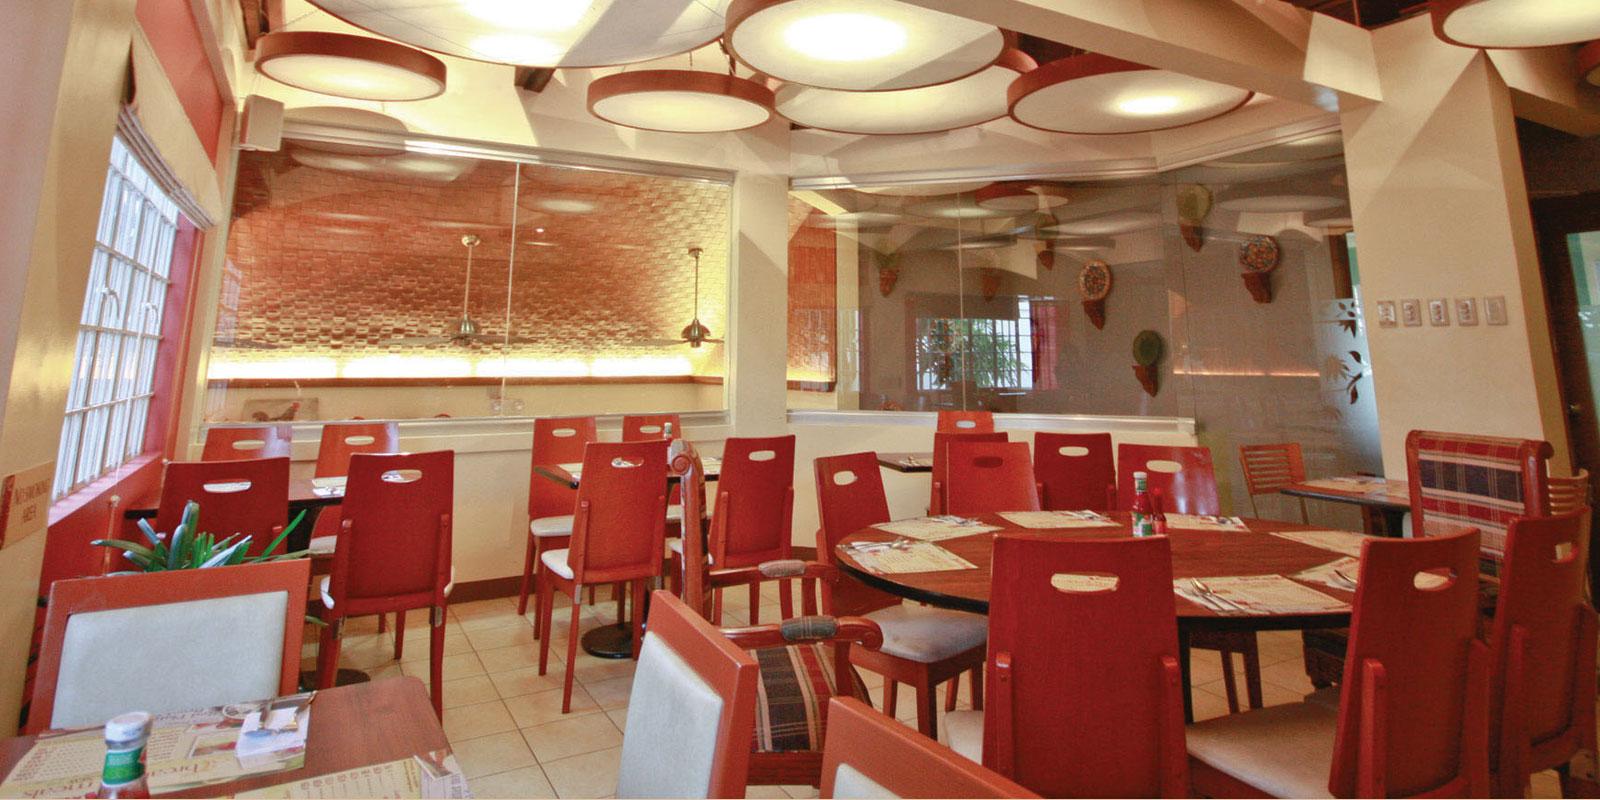 About Red Platter Restaurant